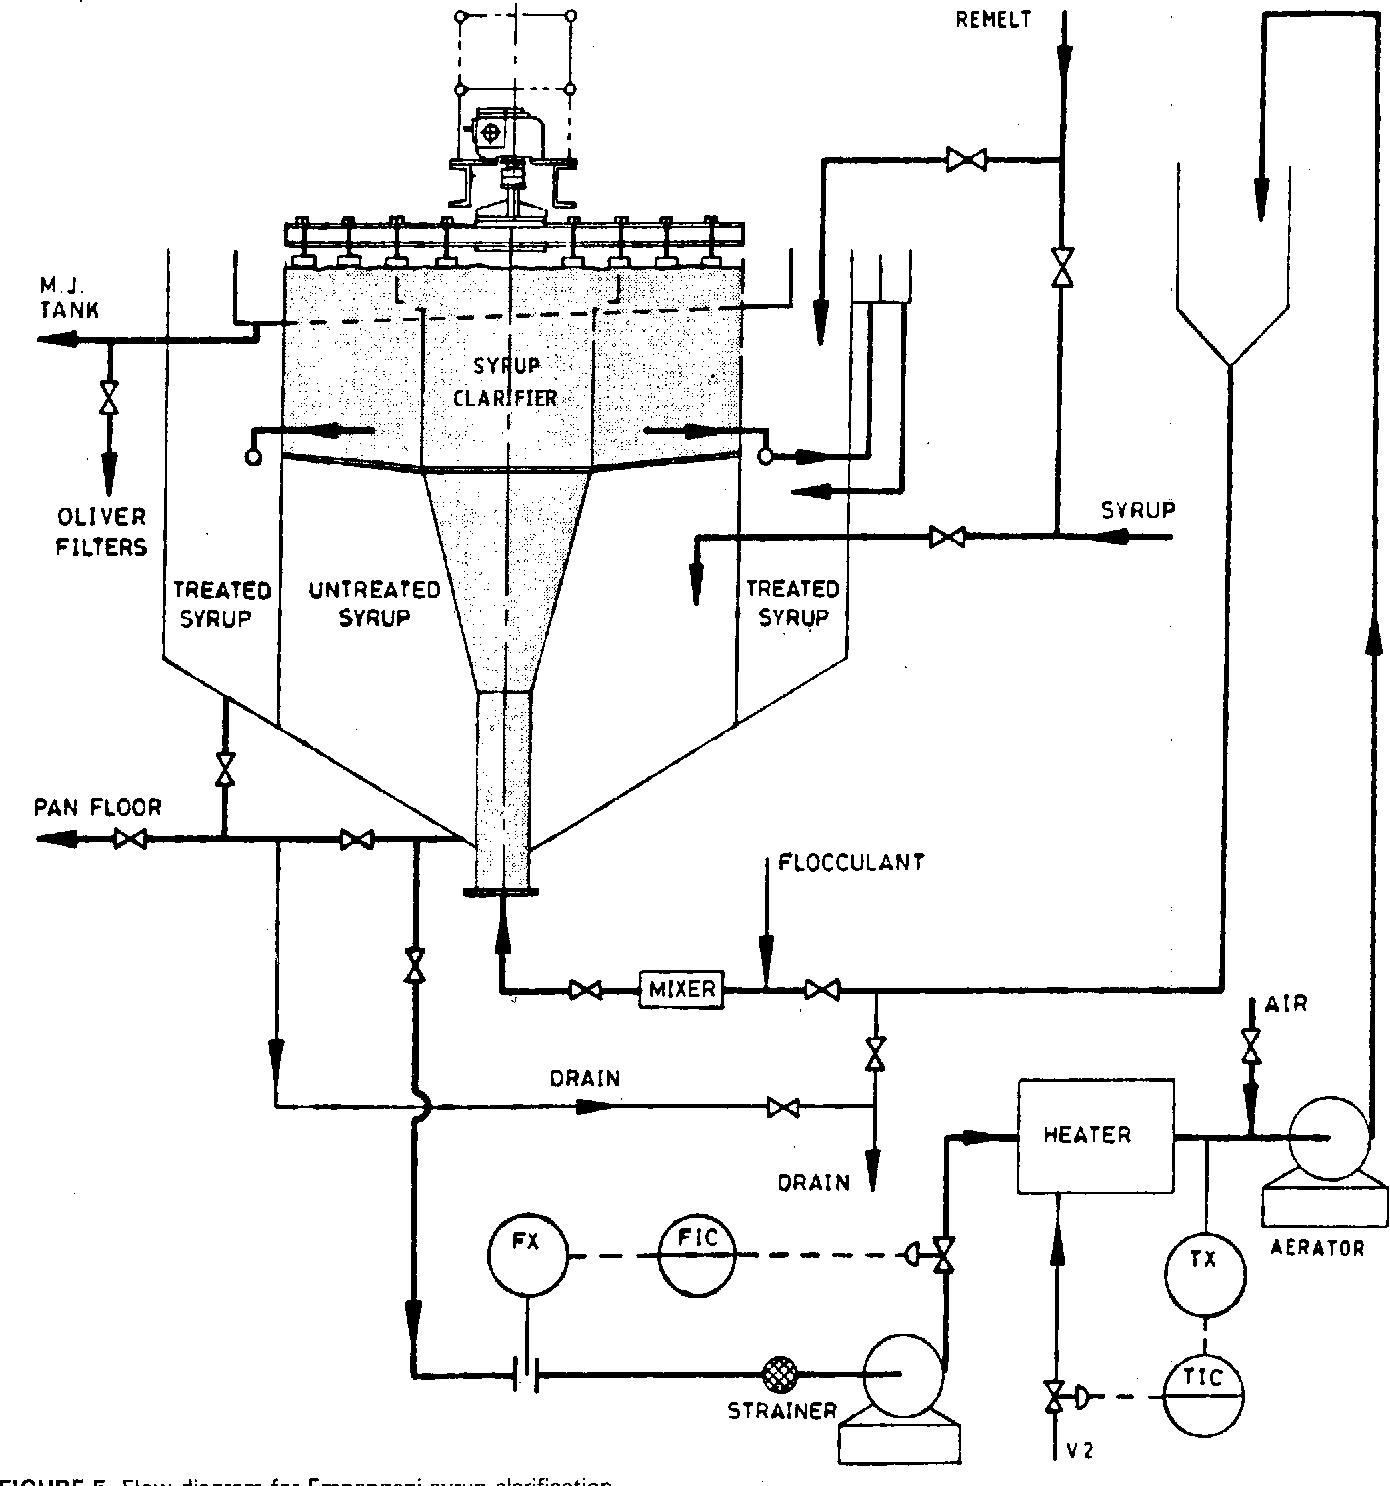 FIGURE 5 Flow diagram for Empangeni syrup clarification.